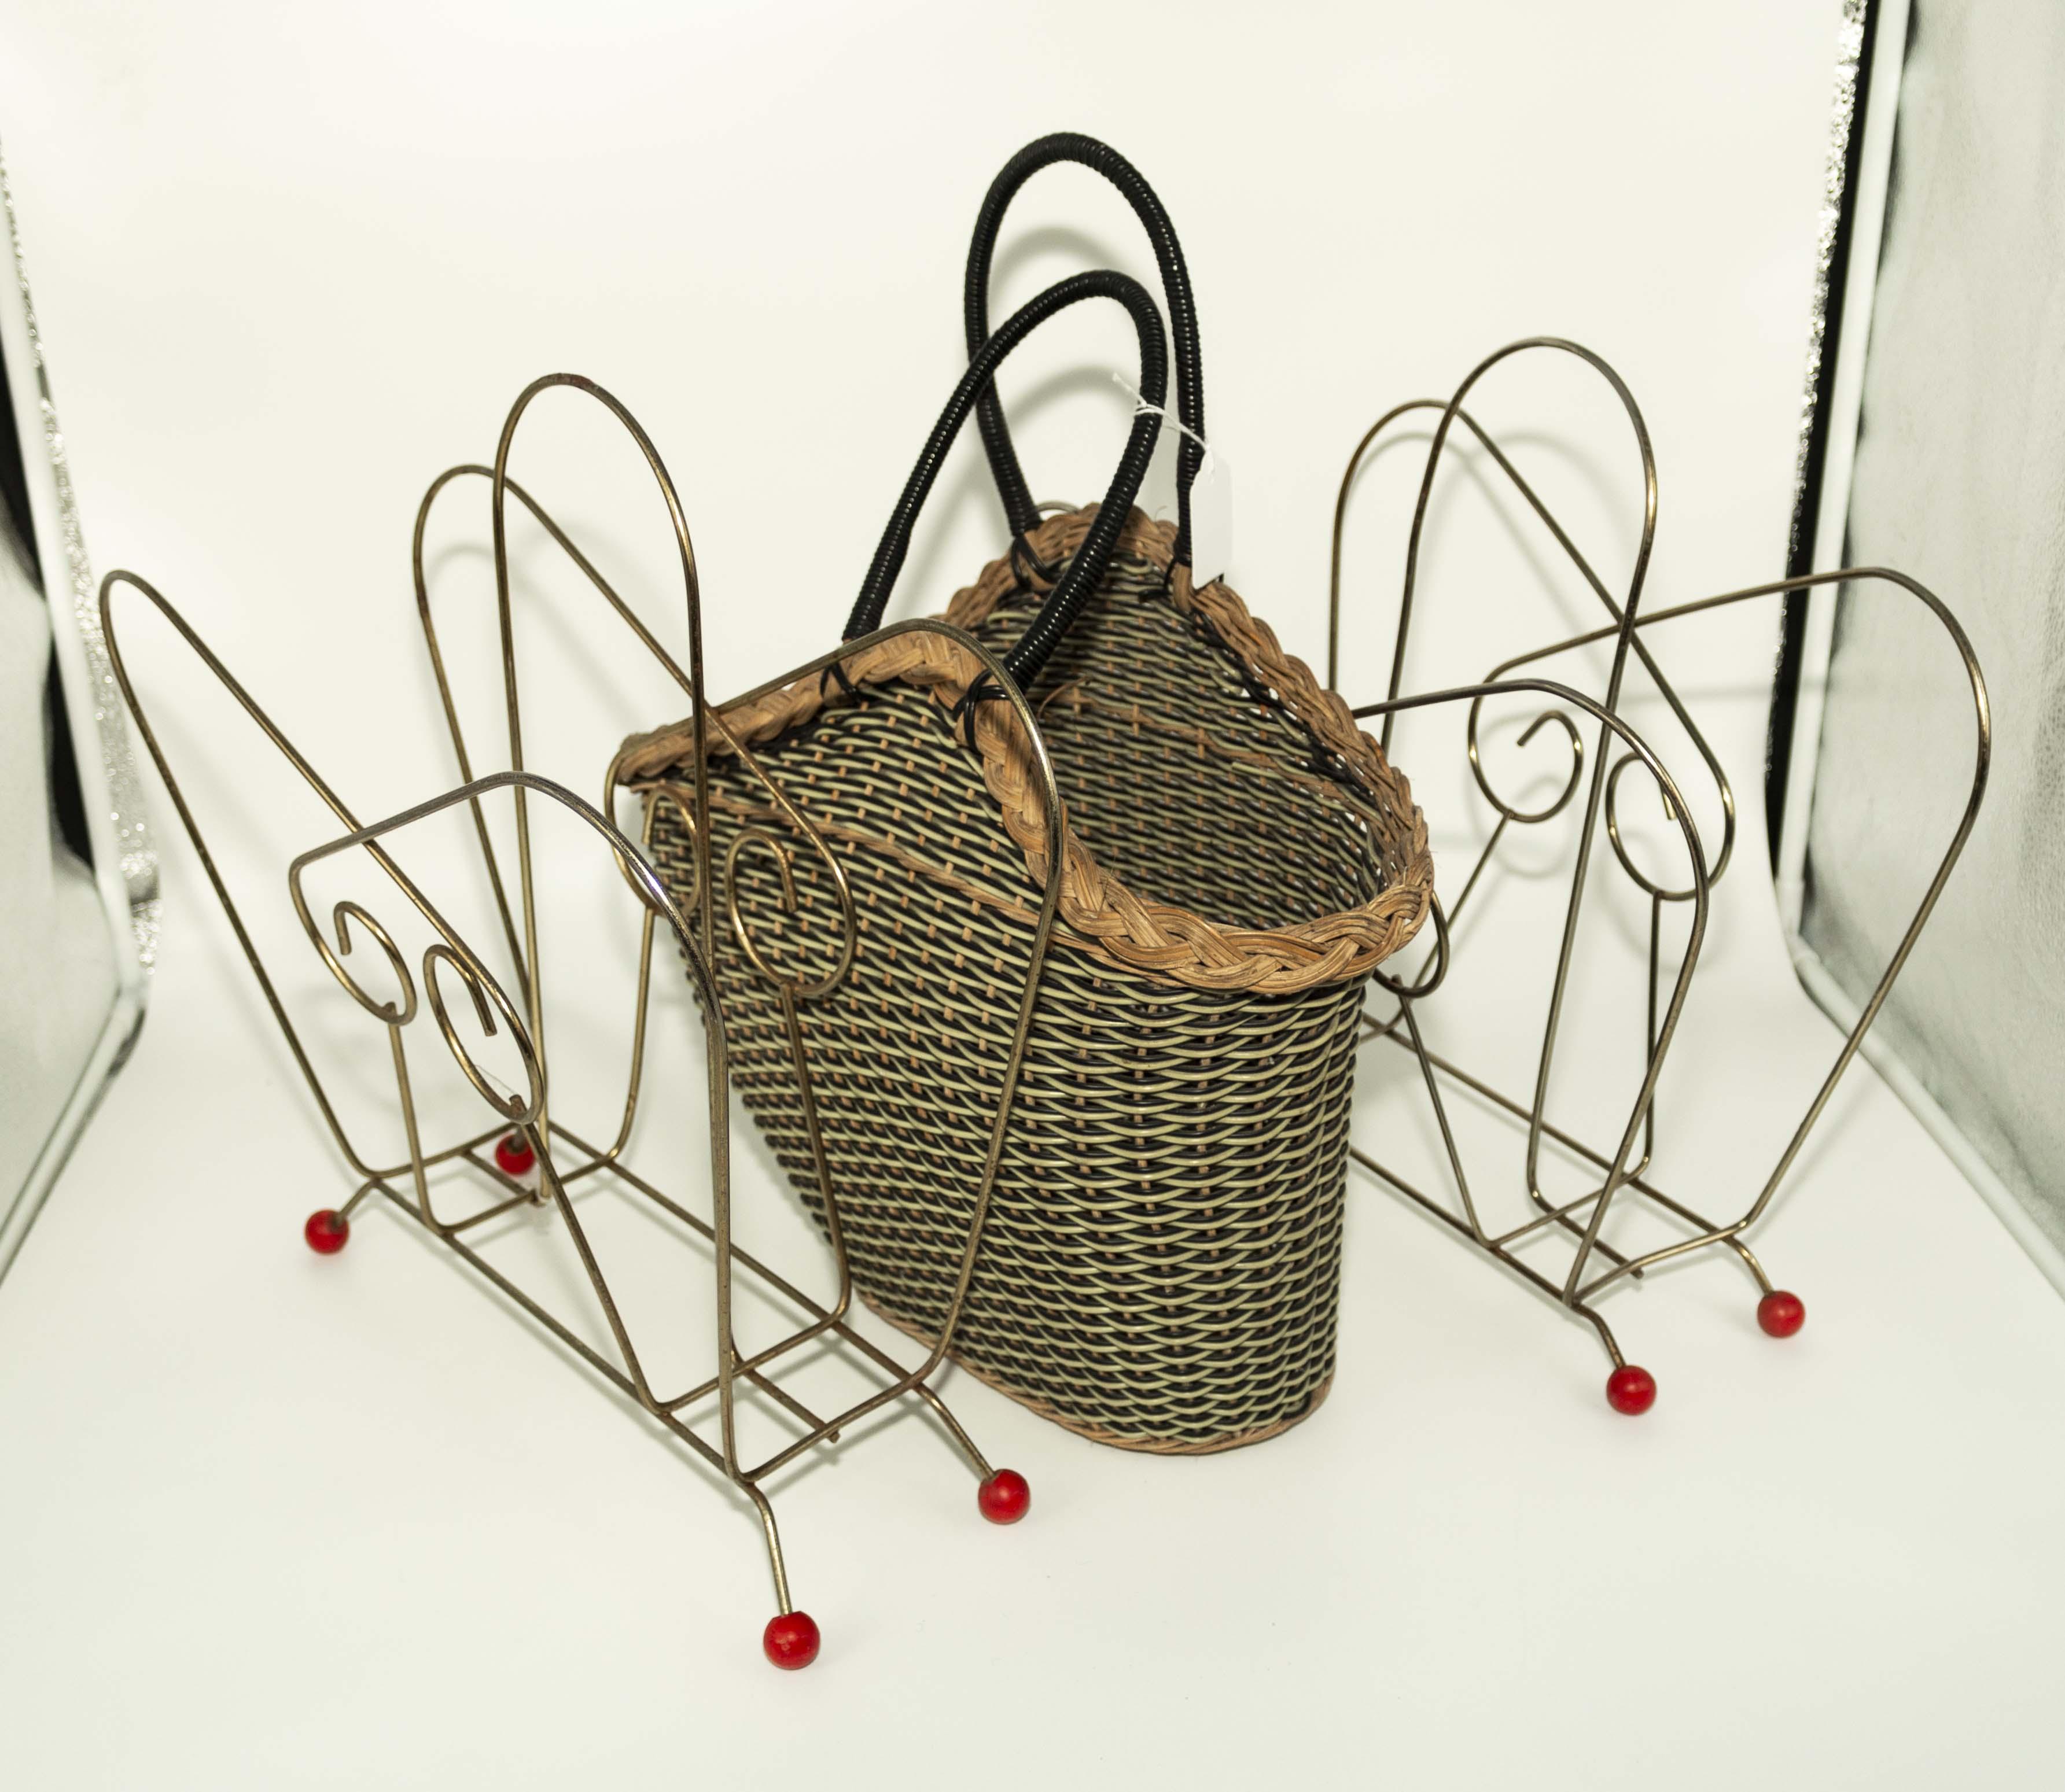 Two vintage 1960's magazine racks and a basket